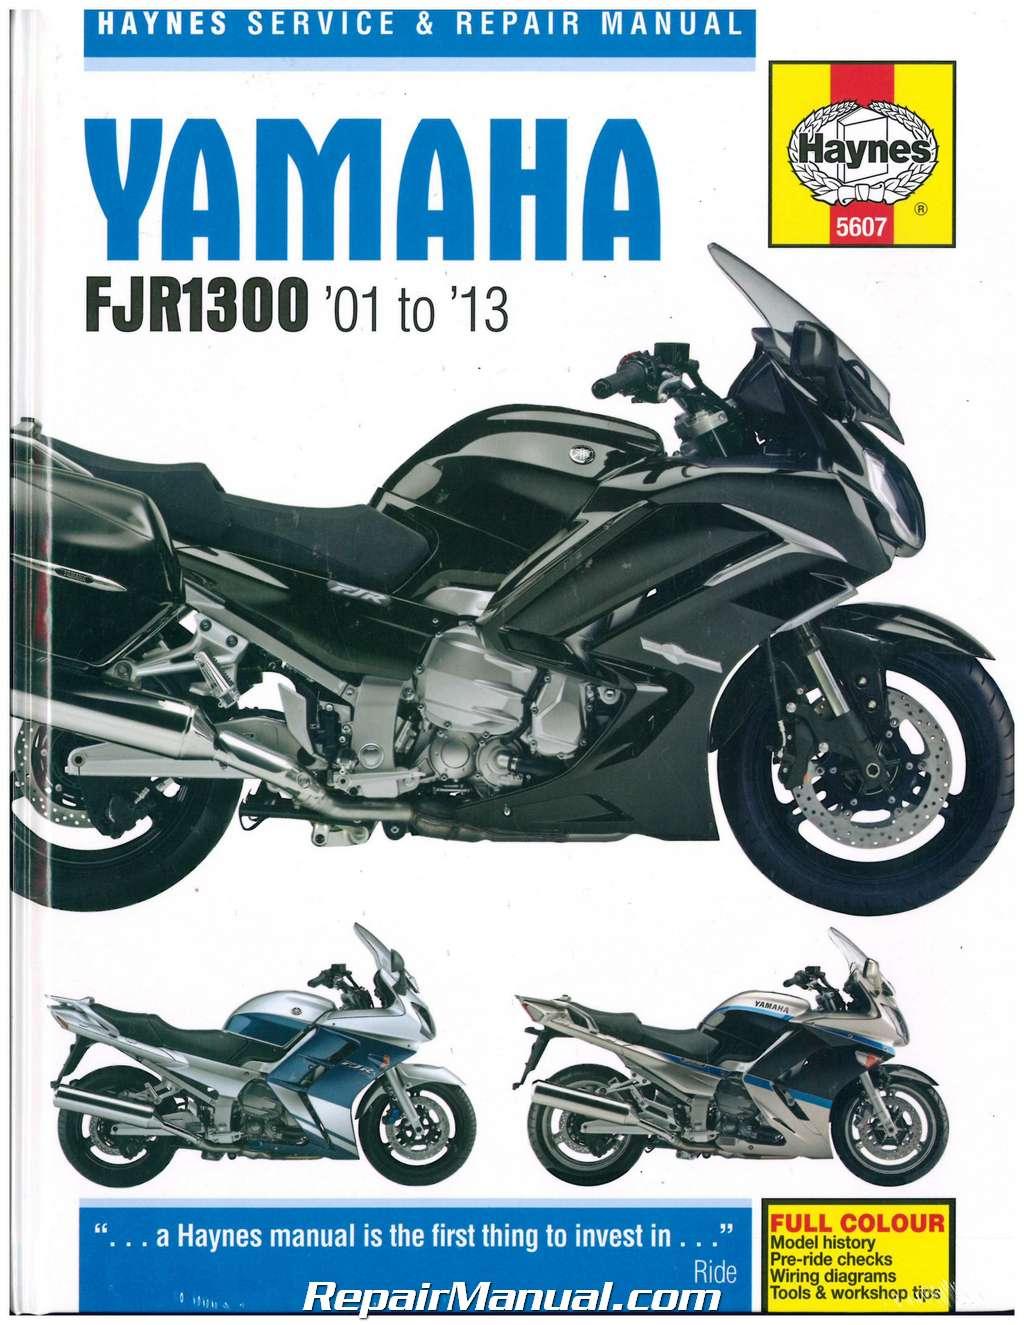 yamaha fjr1300 2001 2013 haynes motorcycle repair manual. Black Bedroom Furniture Sets. Home Design Ideas